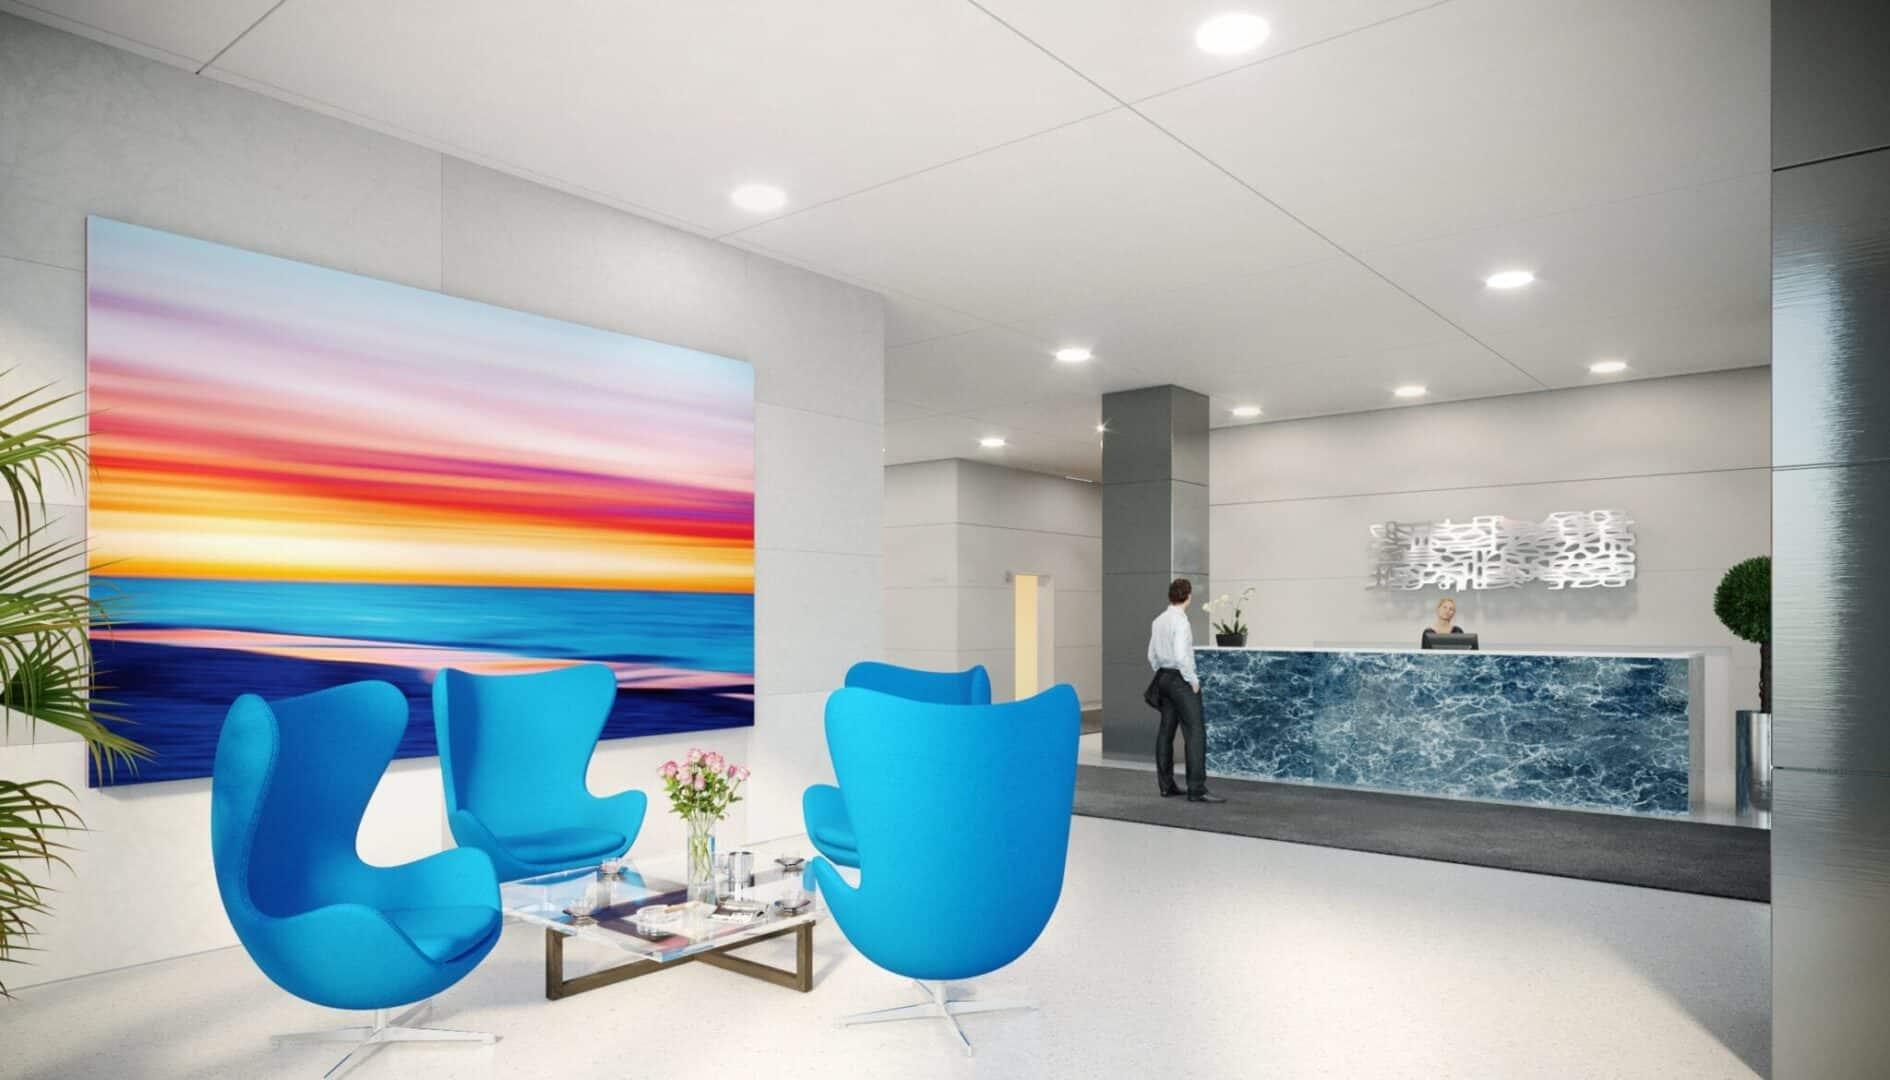 New-York-lobby-3d-Rendering